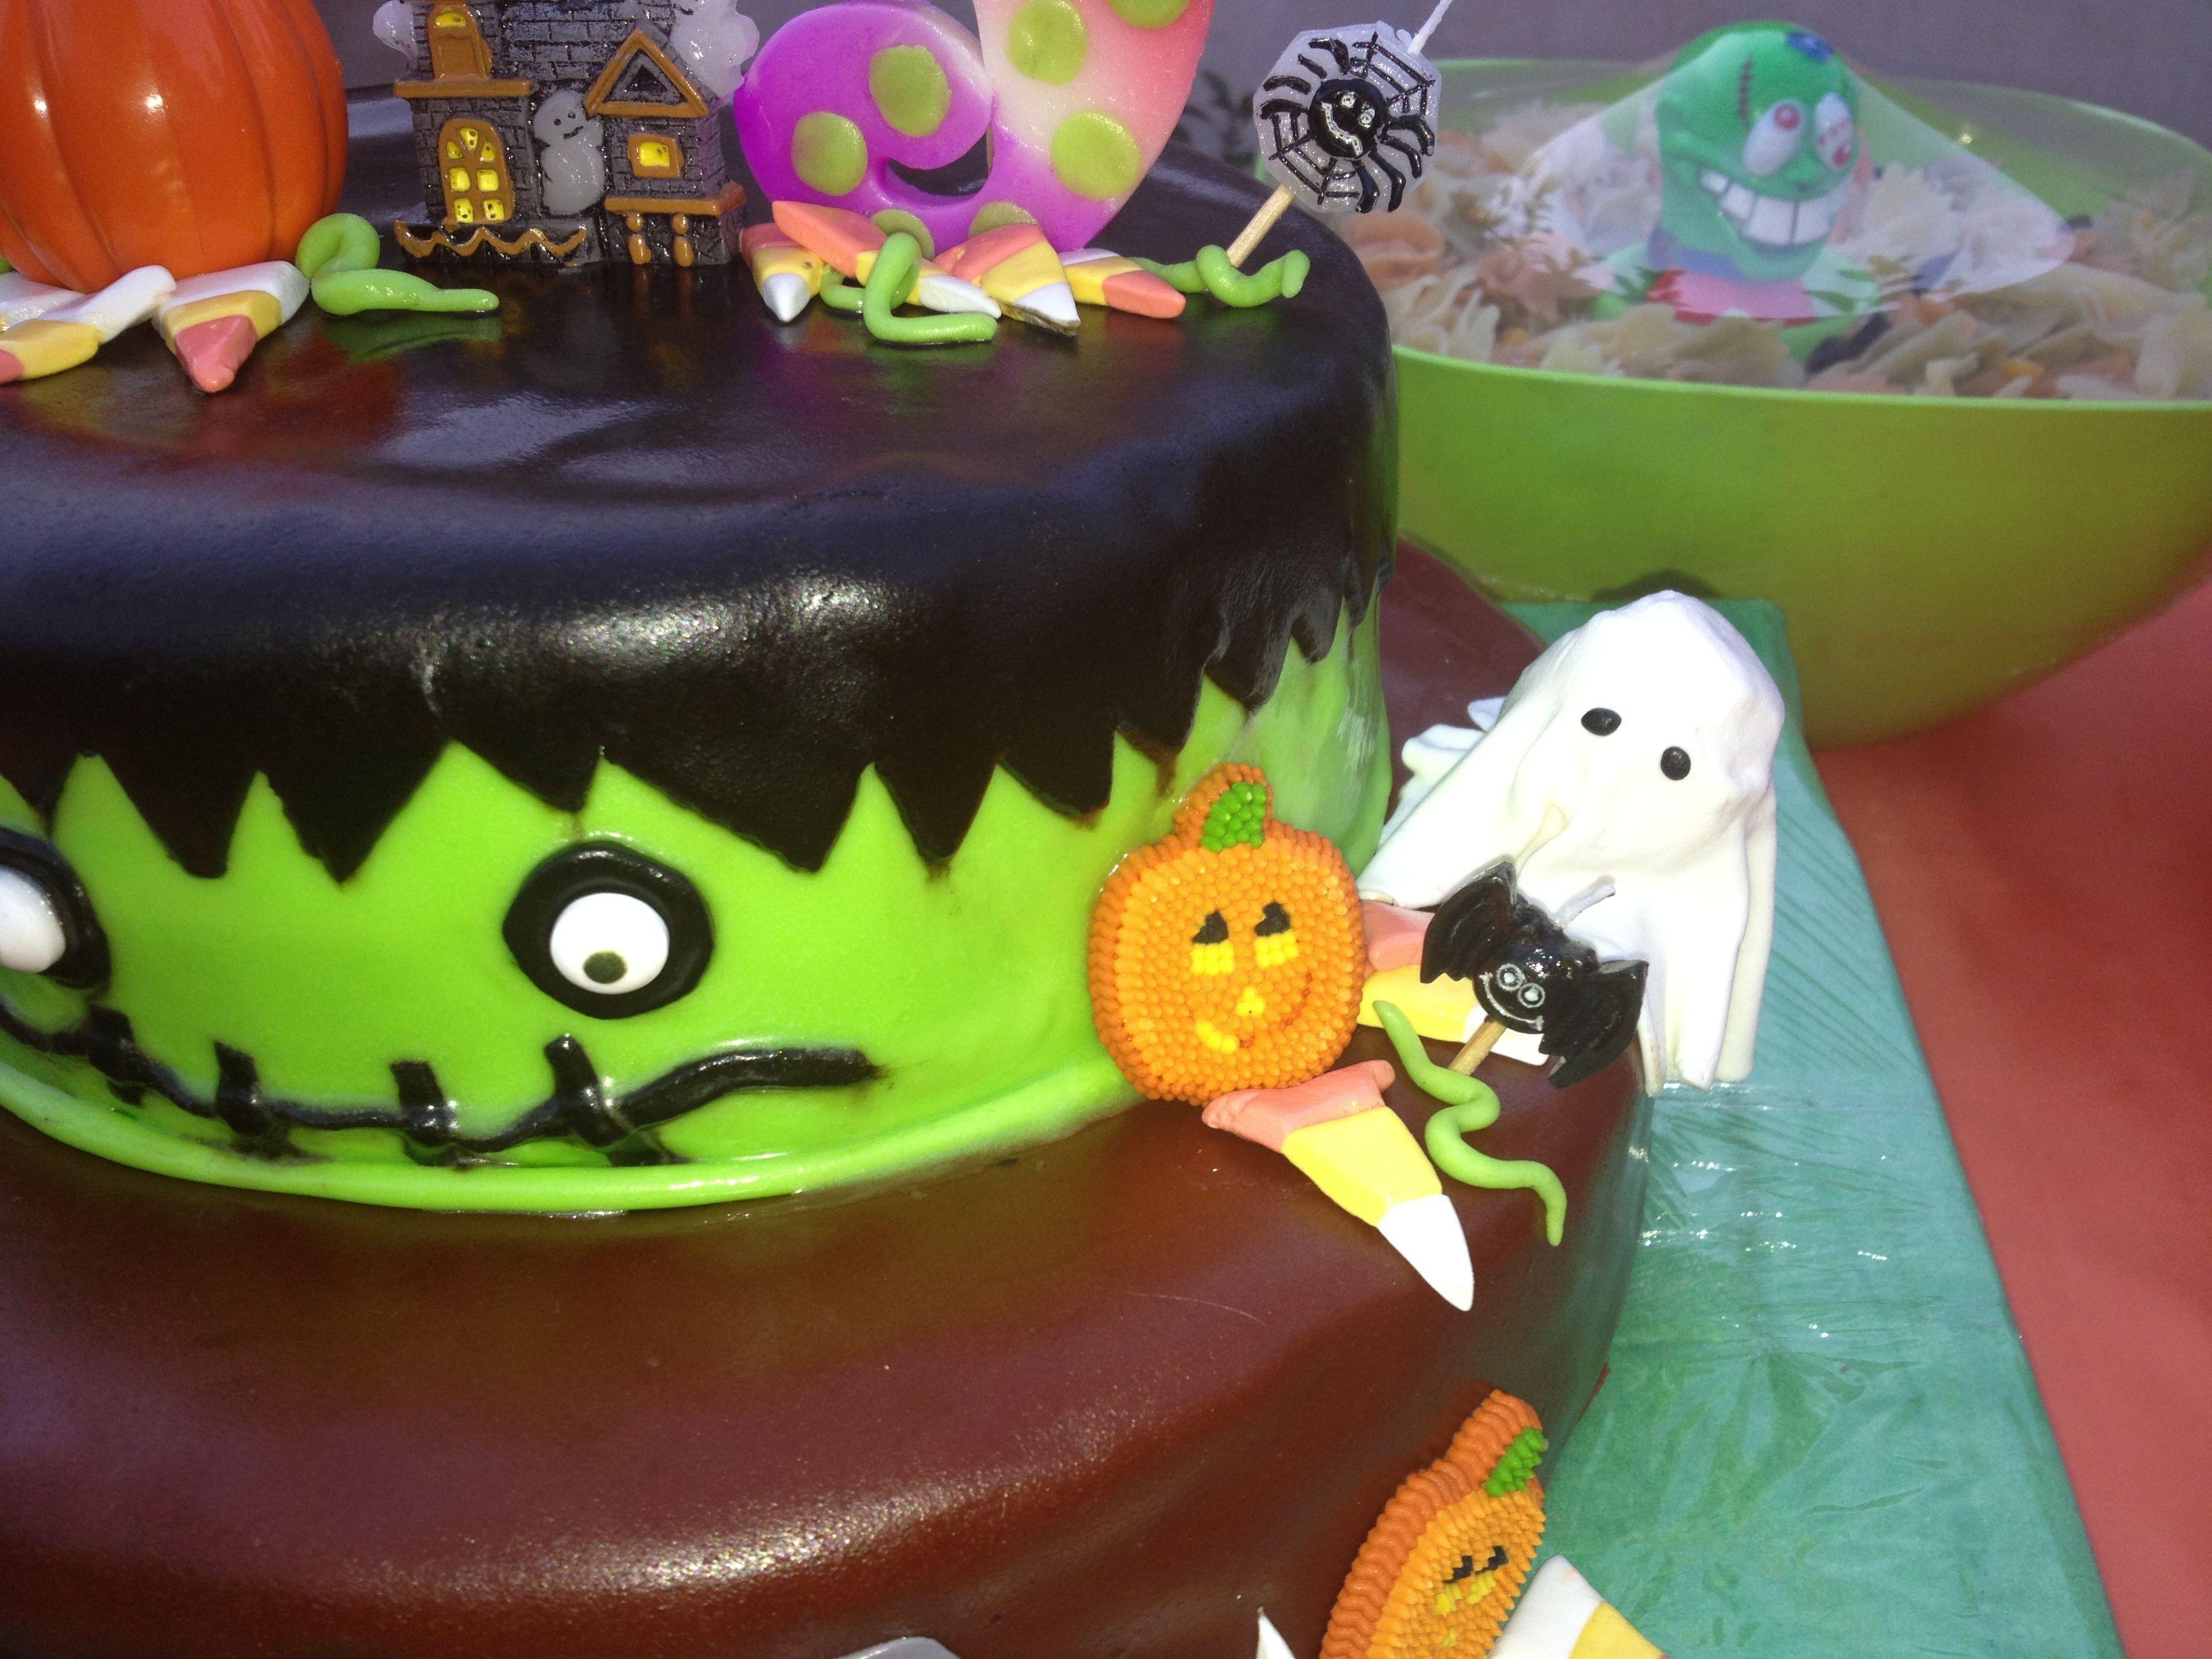 Side Of The Cake Cake Nephew Birthday Birthday Party